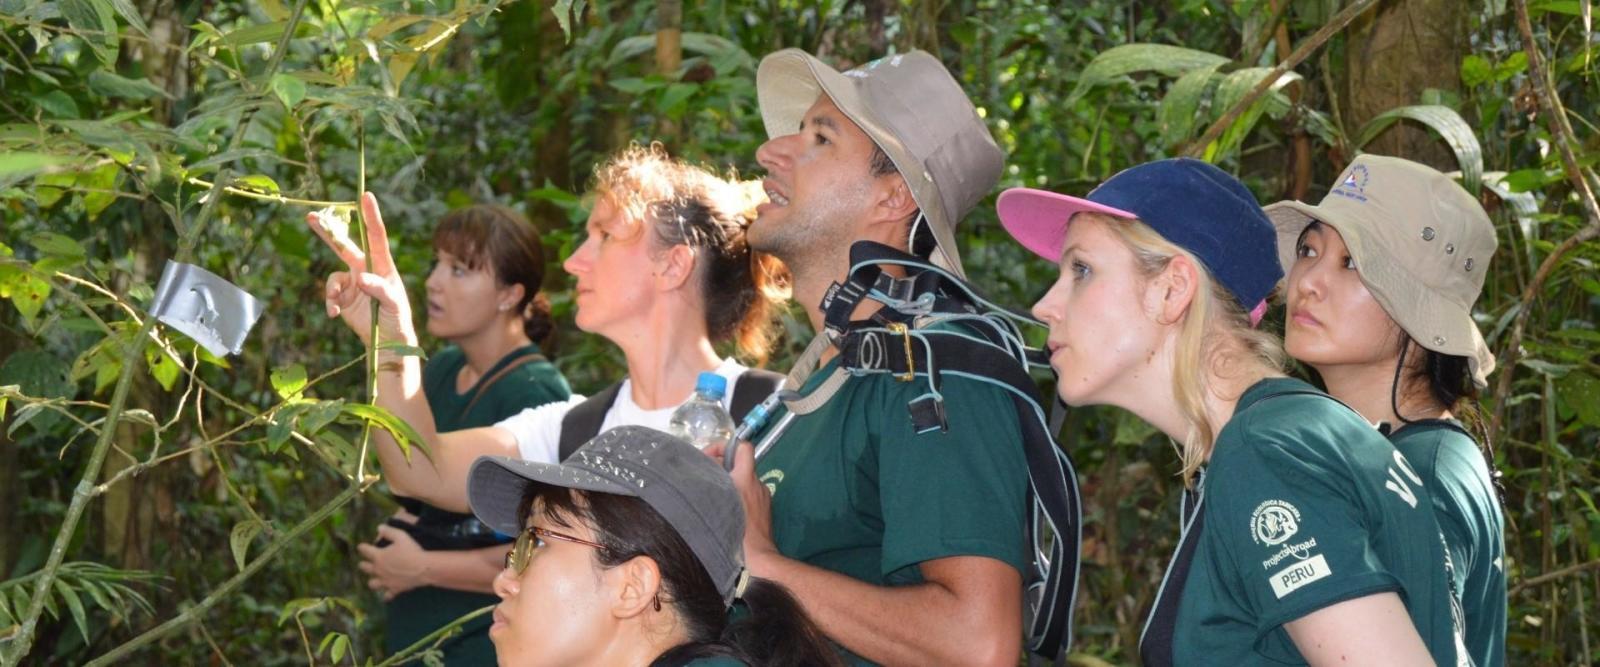 Peru conservation volunteers